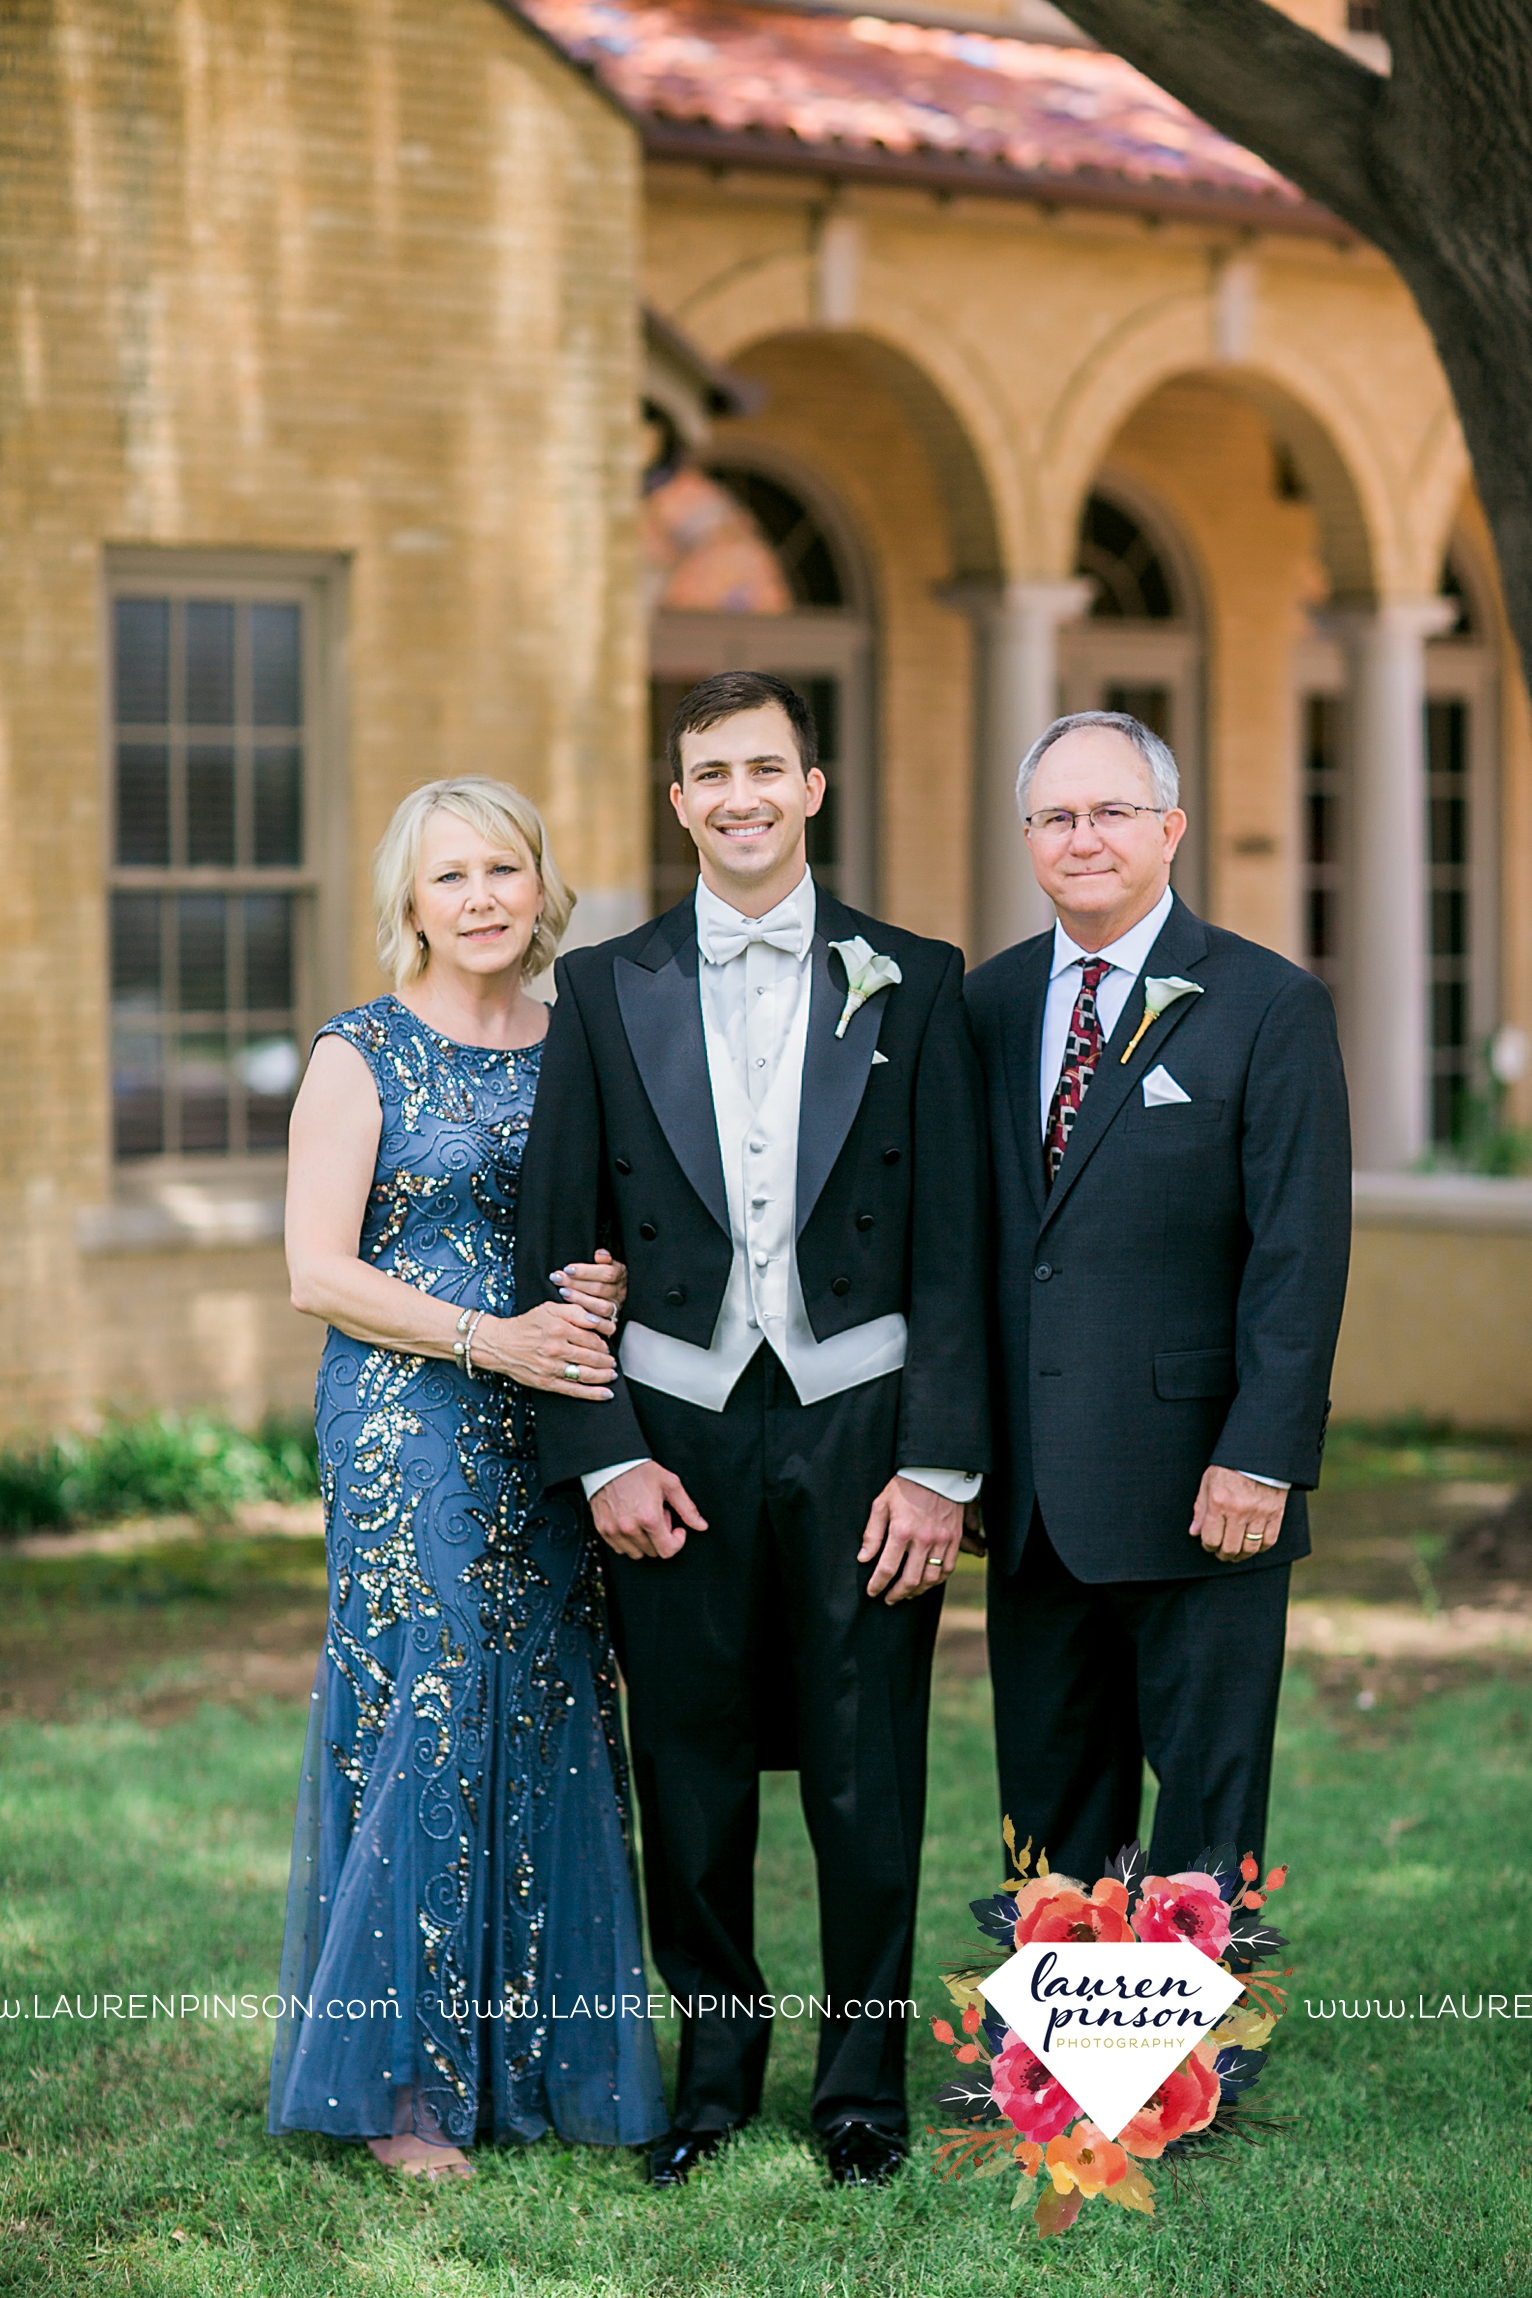 wichita-falls-texas-wedding-photographer-the-forum-by-the-kemp-mayfield-events-ulta-gold-glitter_2851.jpg